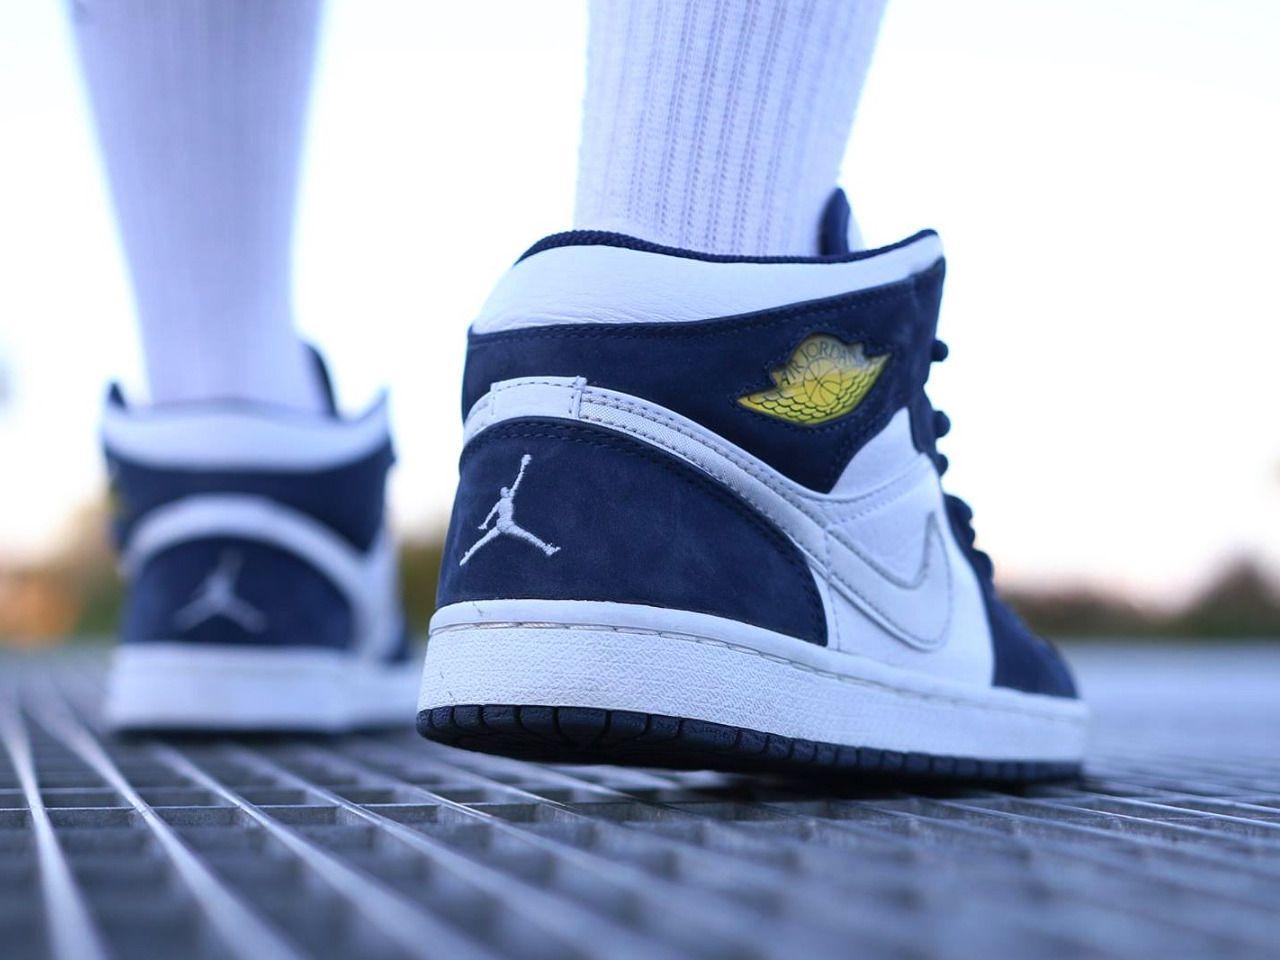 Nike Air Jordan 1 - White/Midnight Navy - 2001 (by tchocolat ...